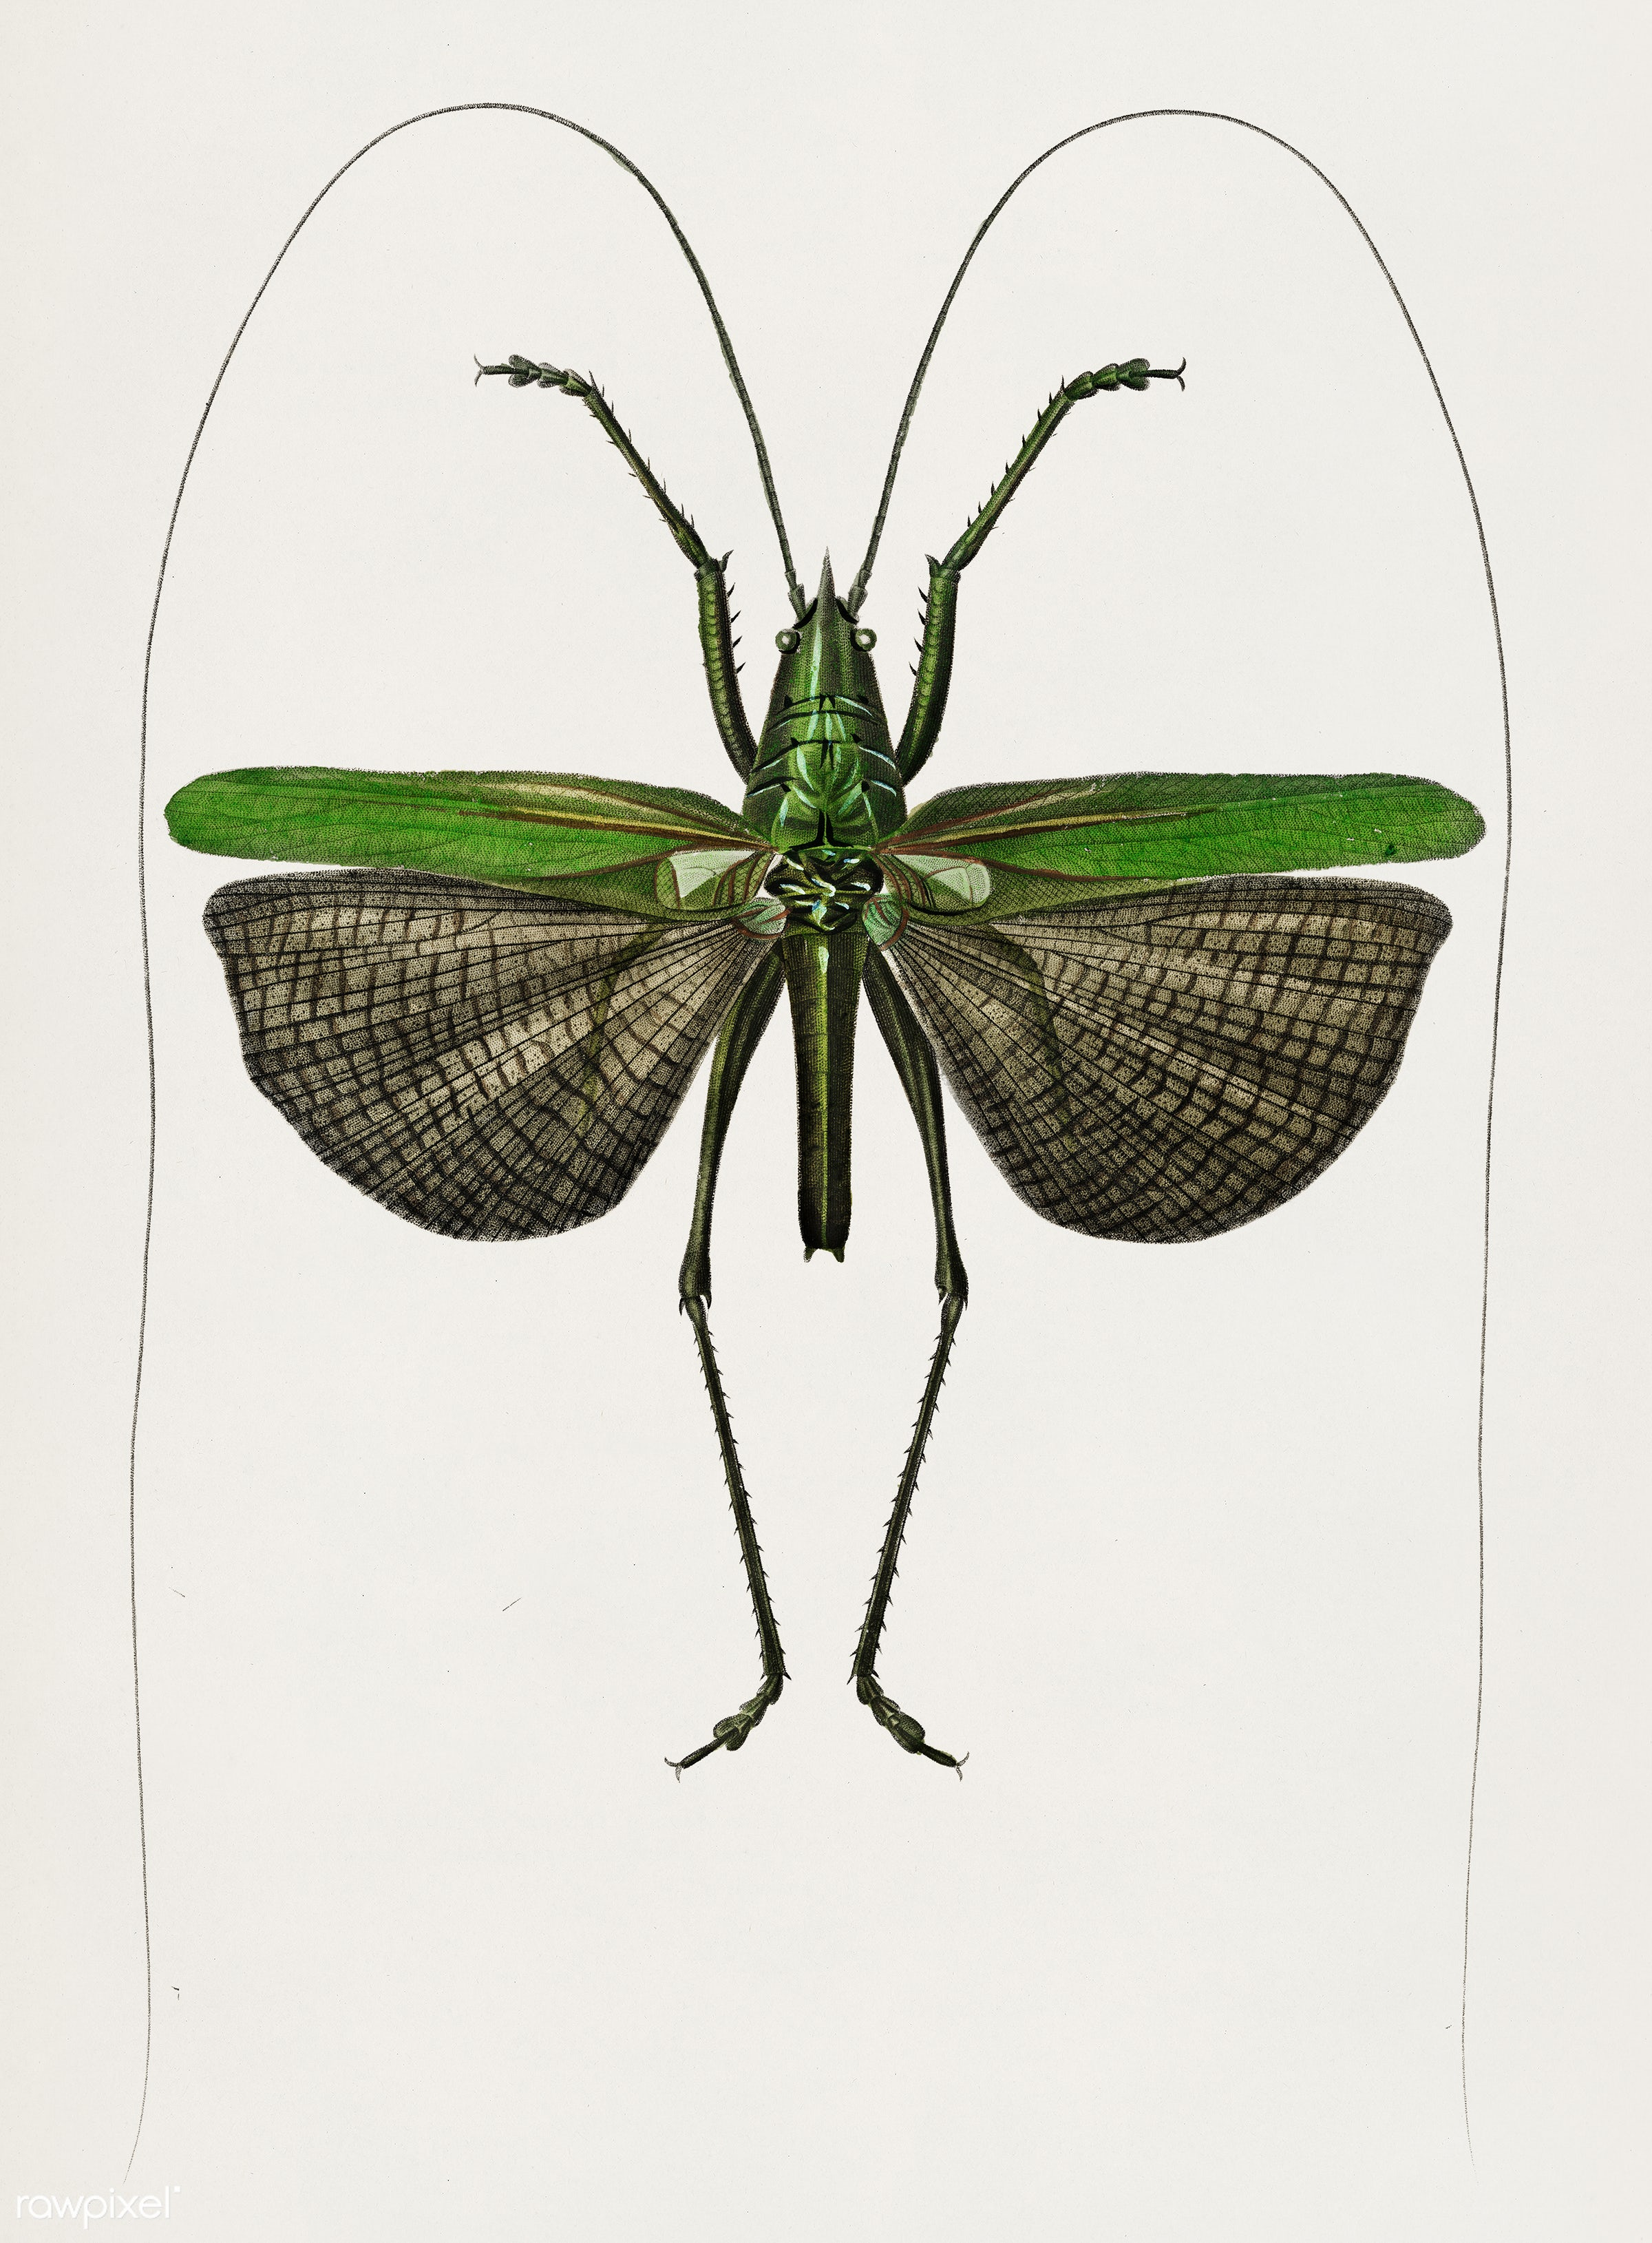 Grasshopper of six points (Locusta sexpunctata) illustrated by Charles Dessalines D' Orbigny (1806-1876). Digitally...